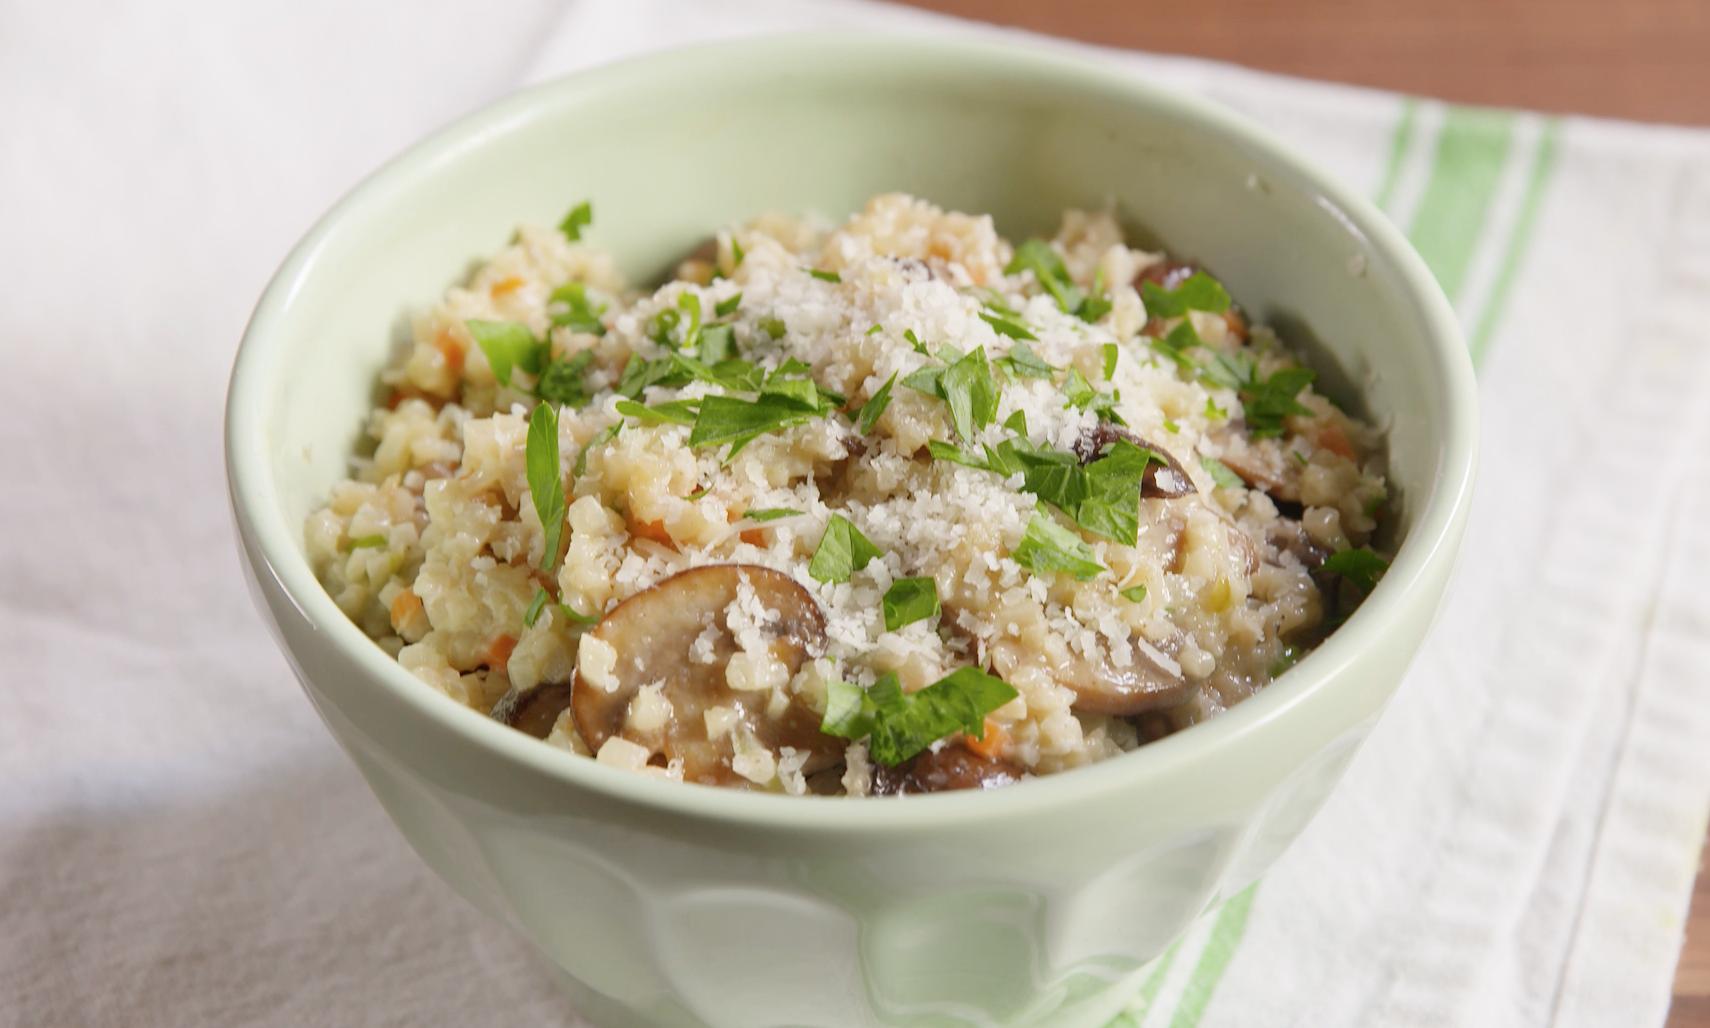 Mushroom Risotto with Riced Cauliflower Medley